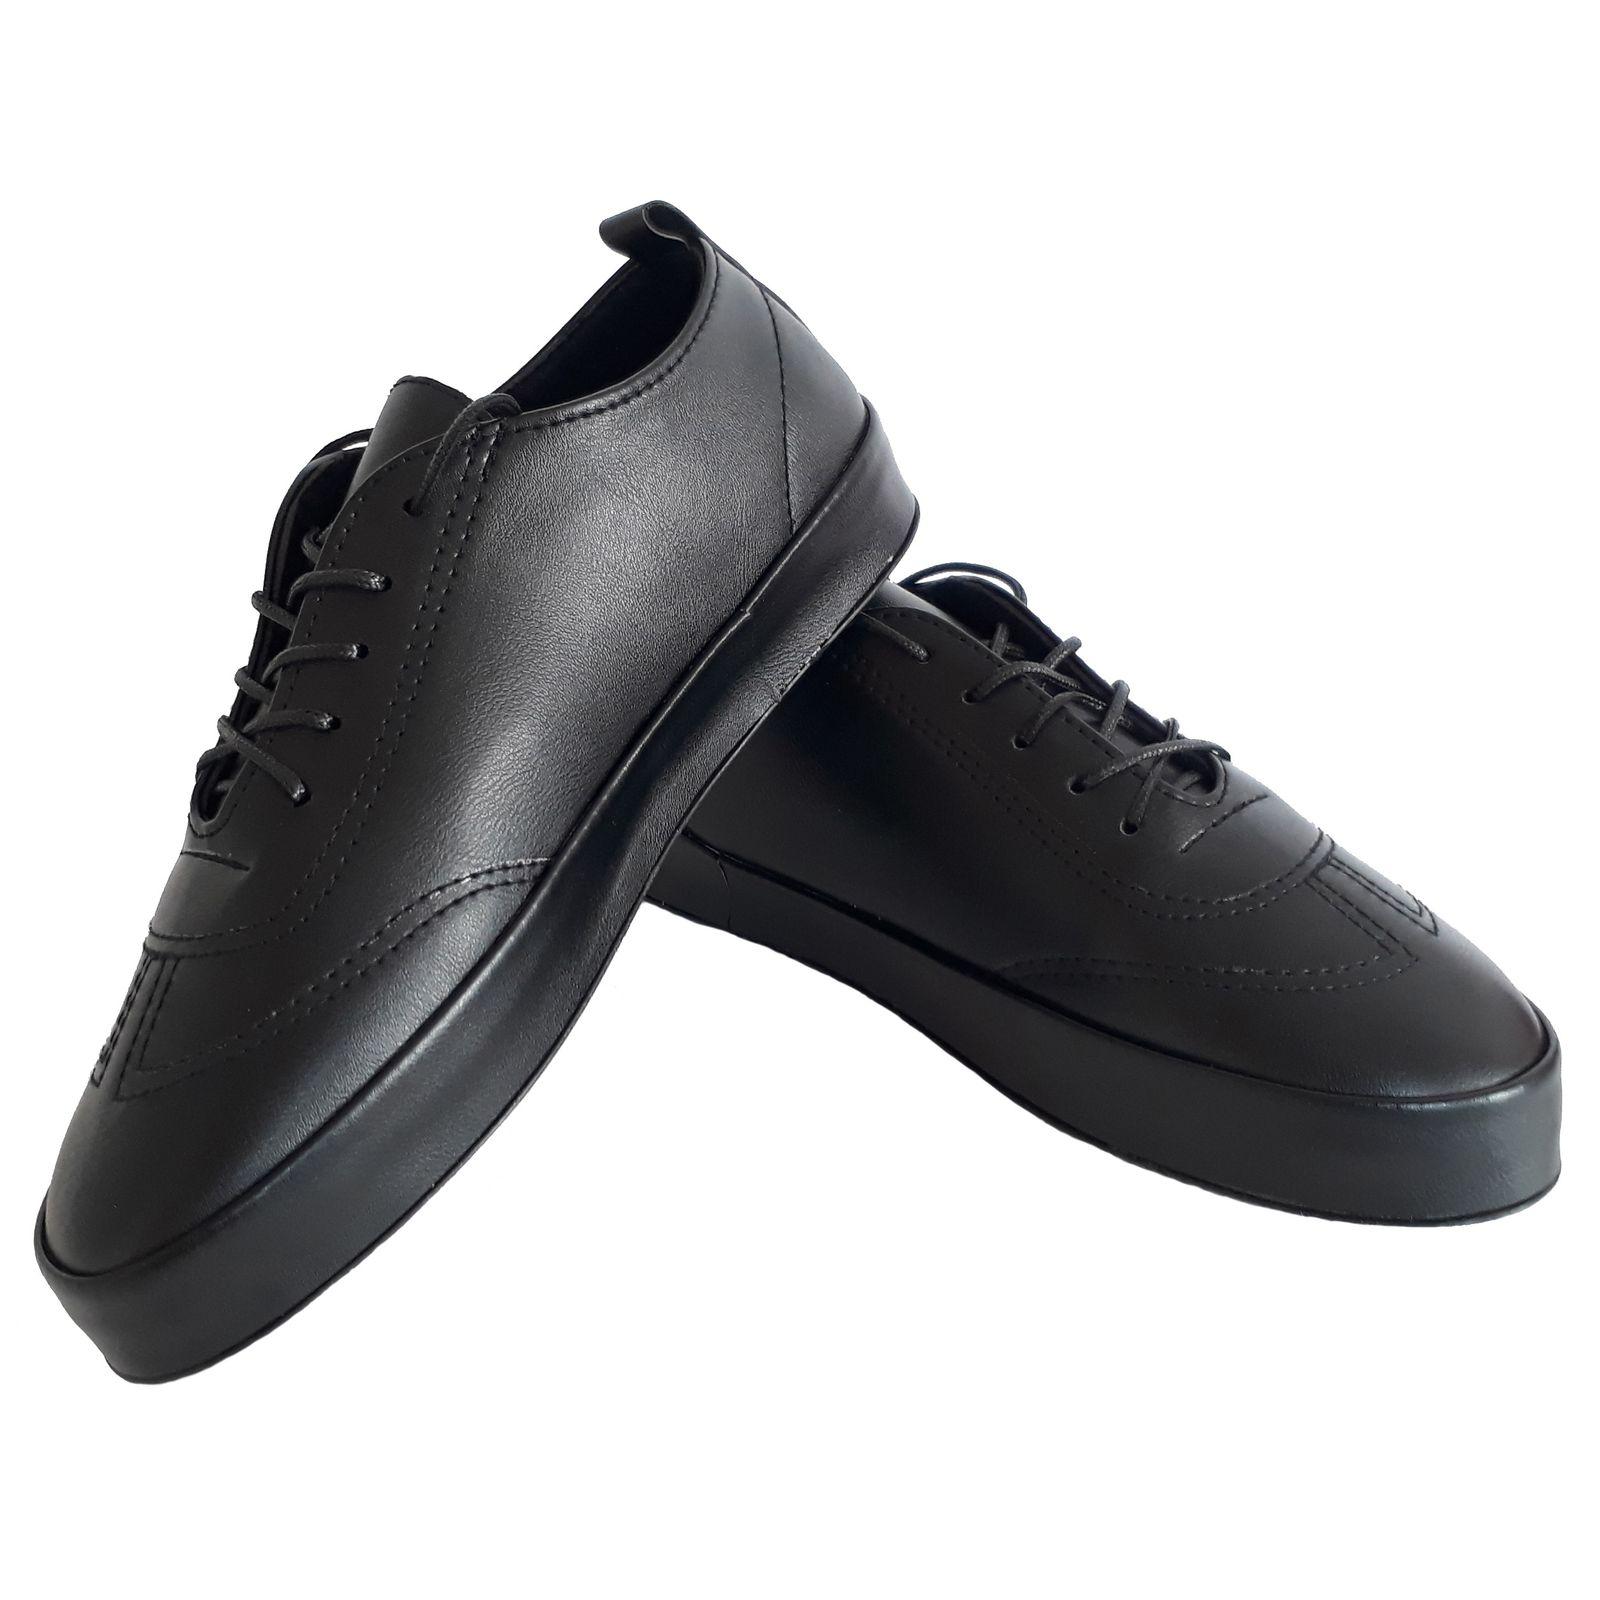 کفش روزمره زنانه کد 1 -  - 3